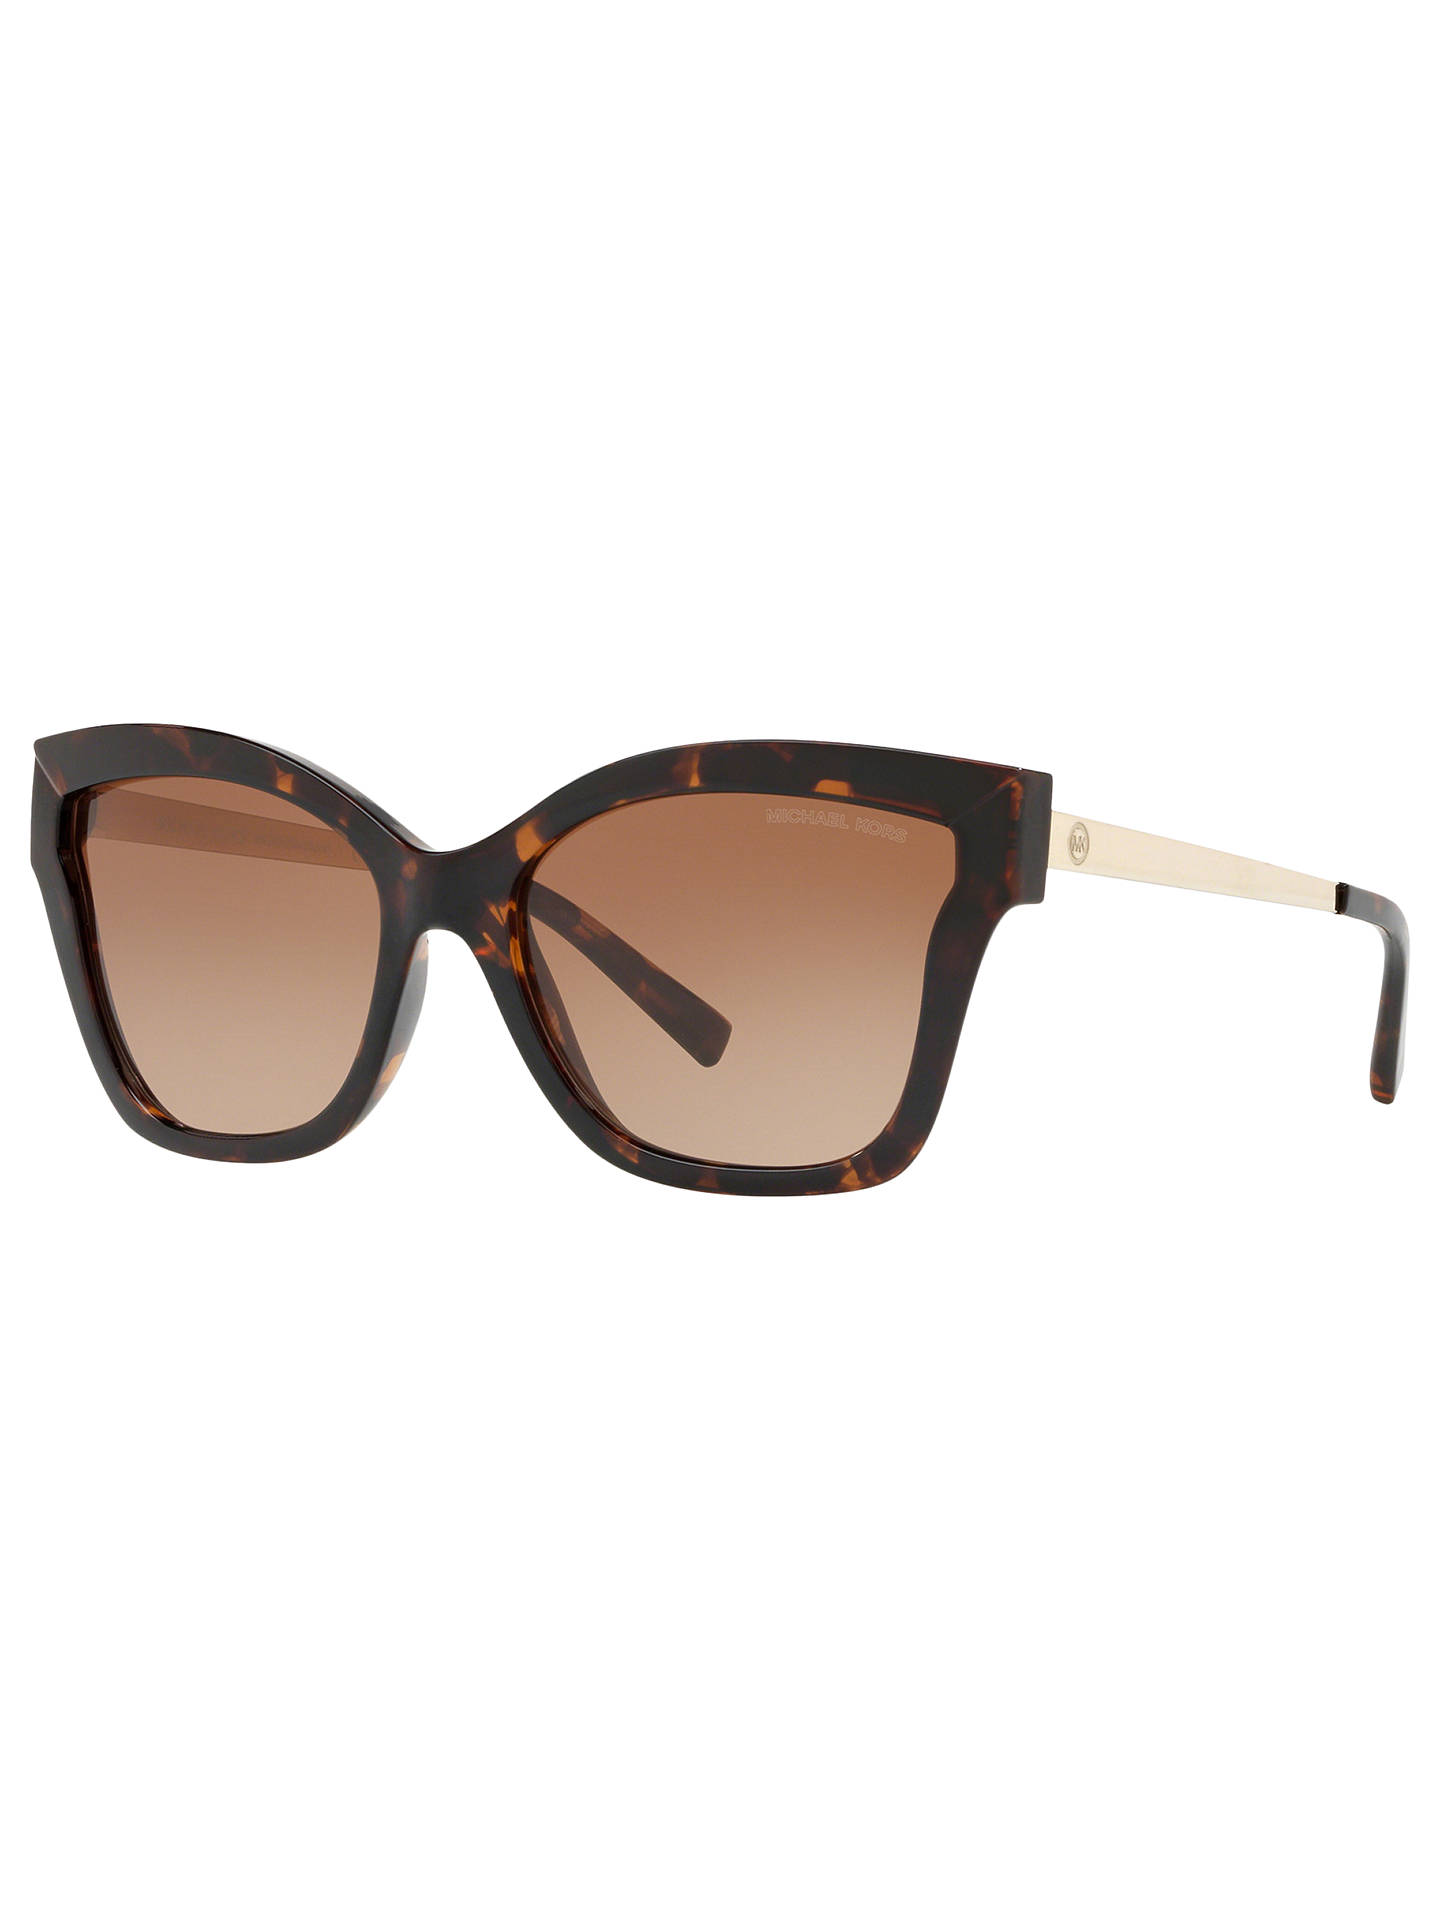 cbdd32fea78 Michael Kors MK2072 Women s Barbados Square Sunglasses at John Lewis ...